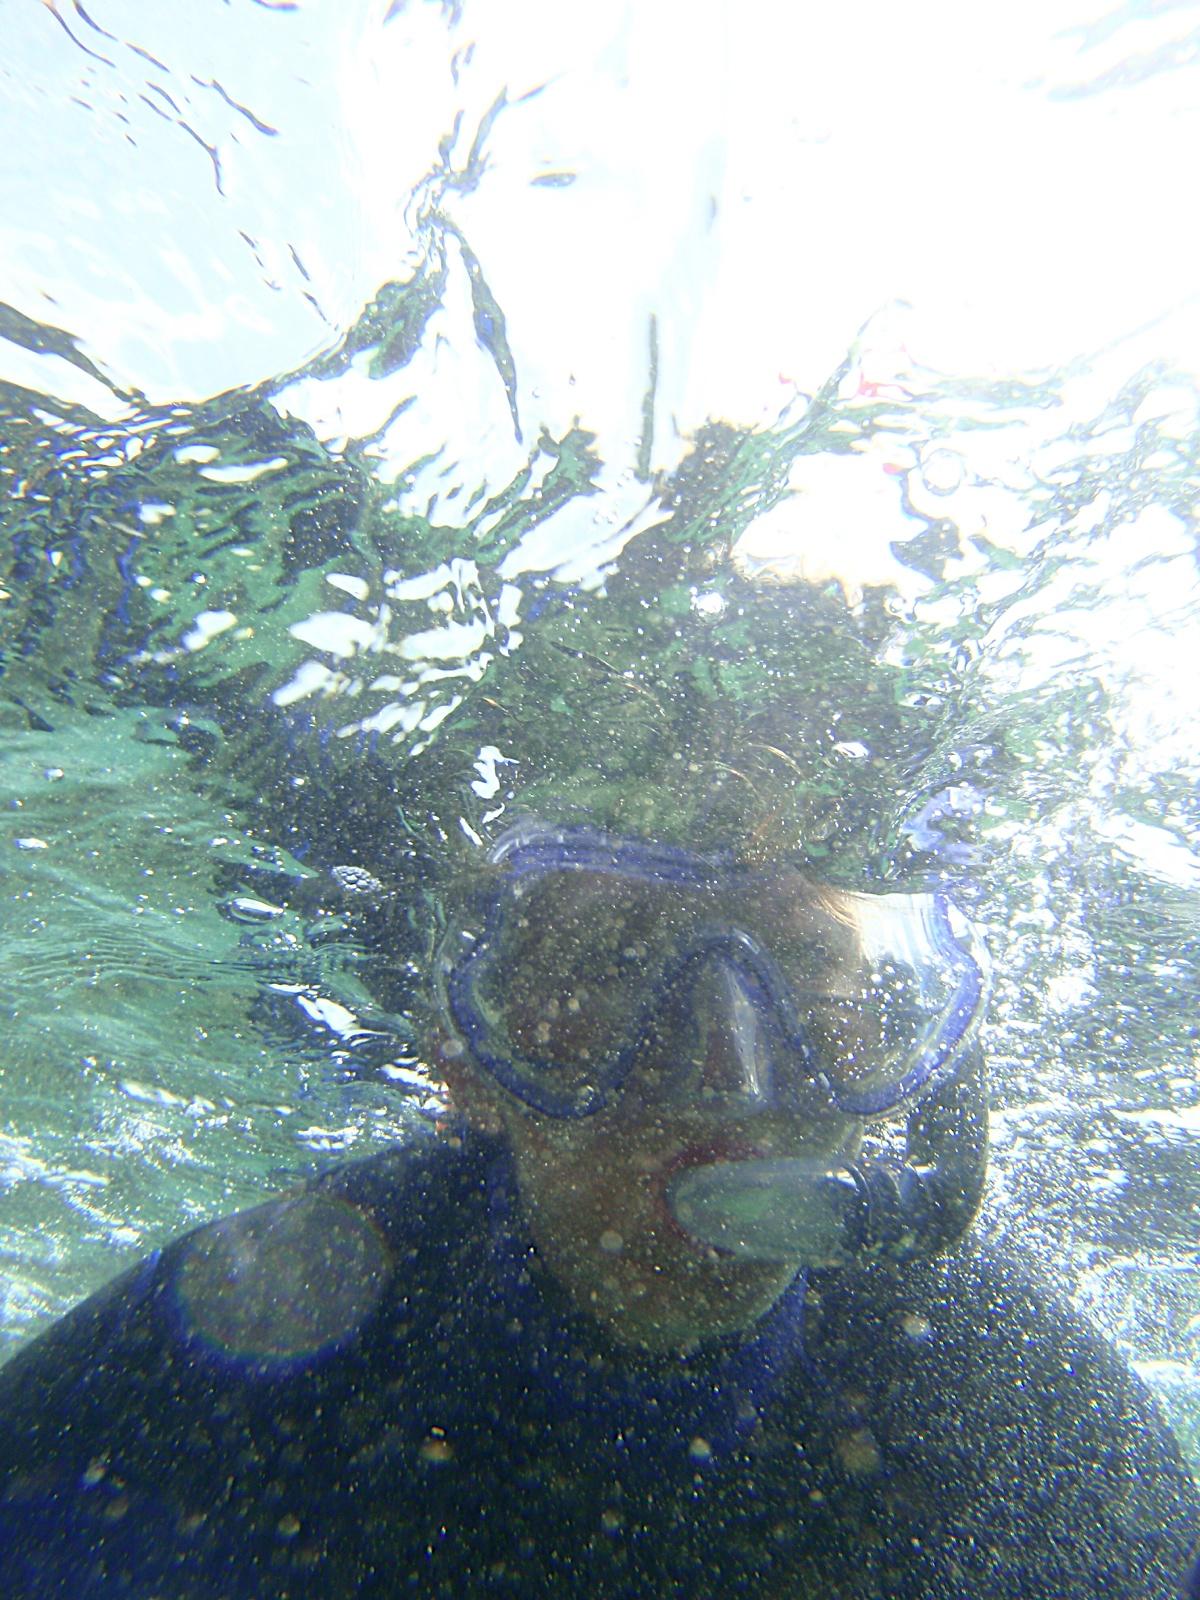 Monogràfic Marí 2010 - P5300352.JPG